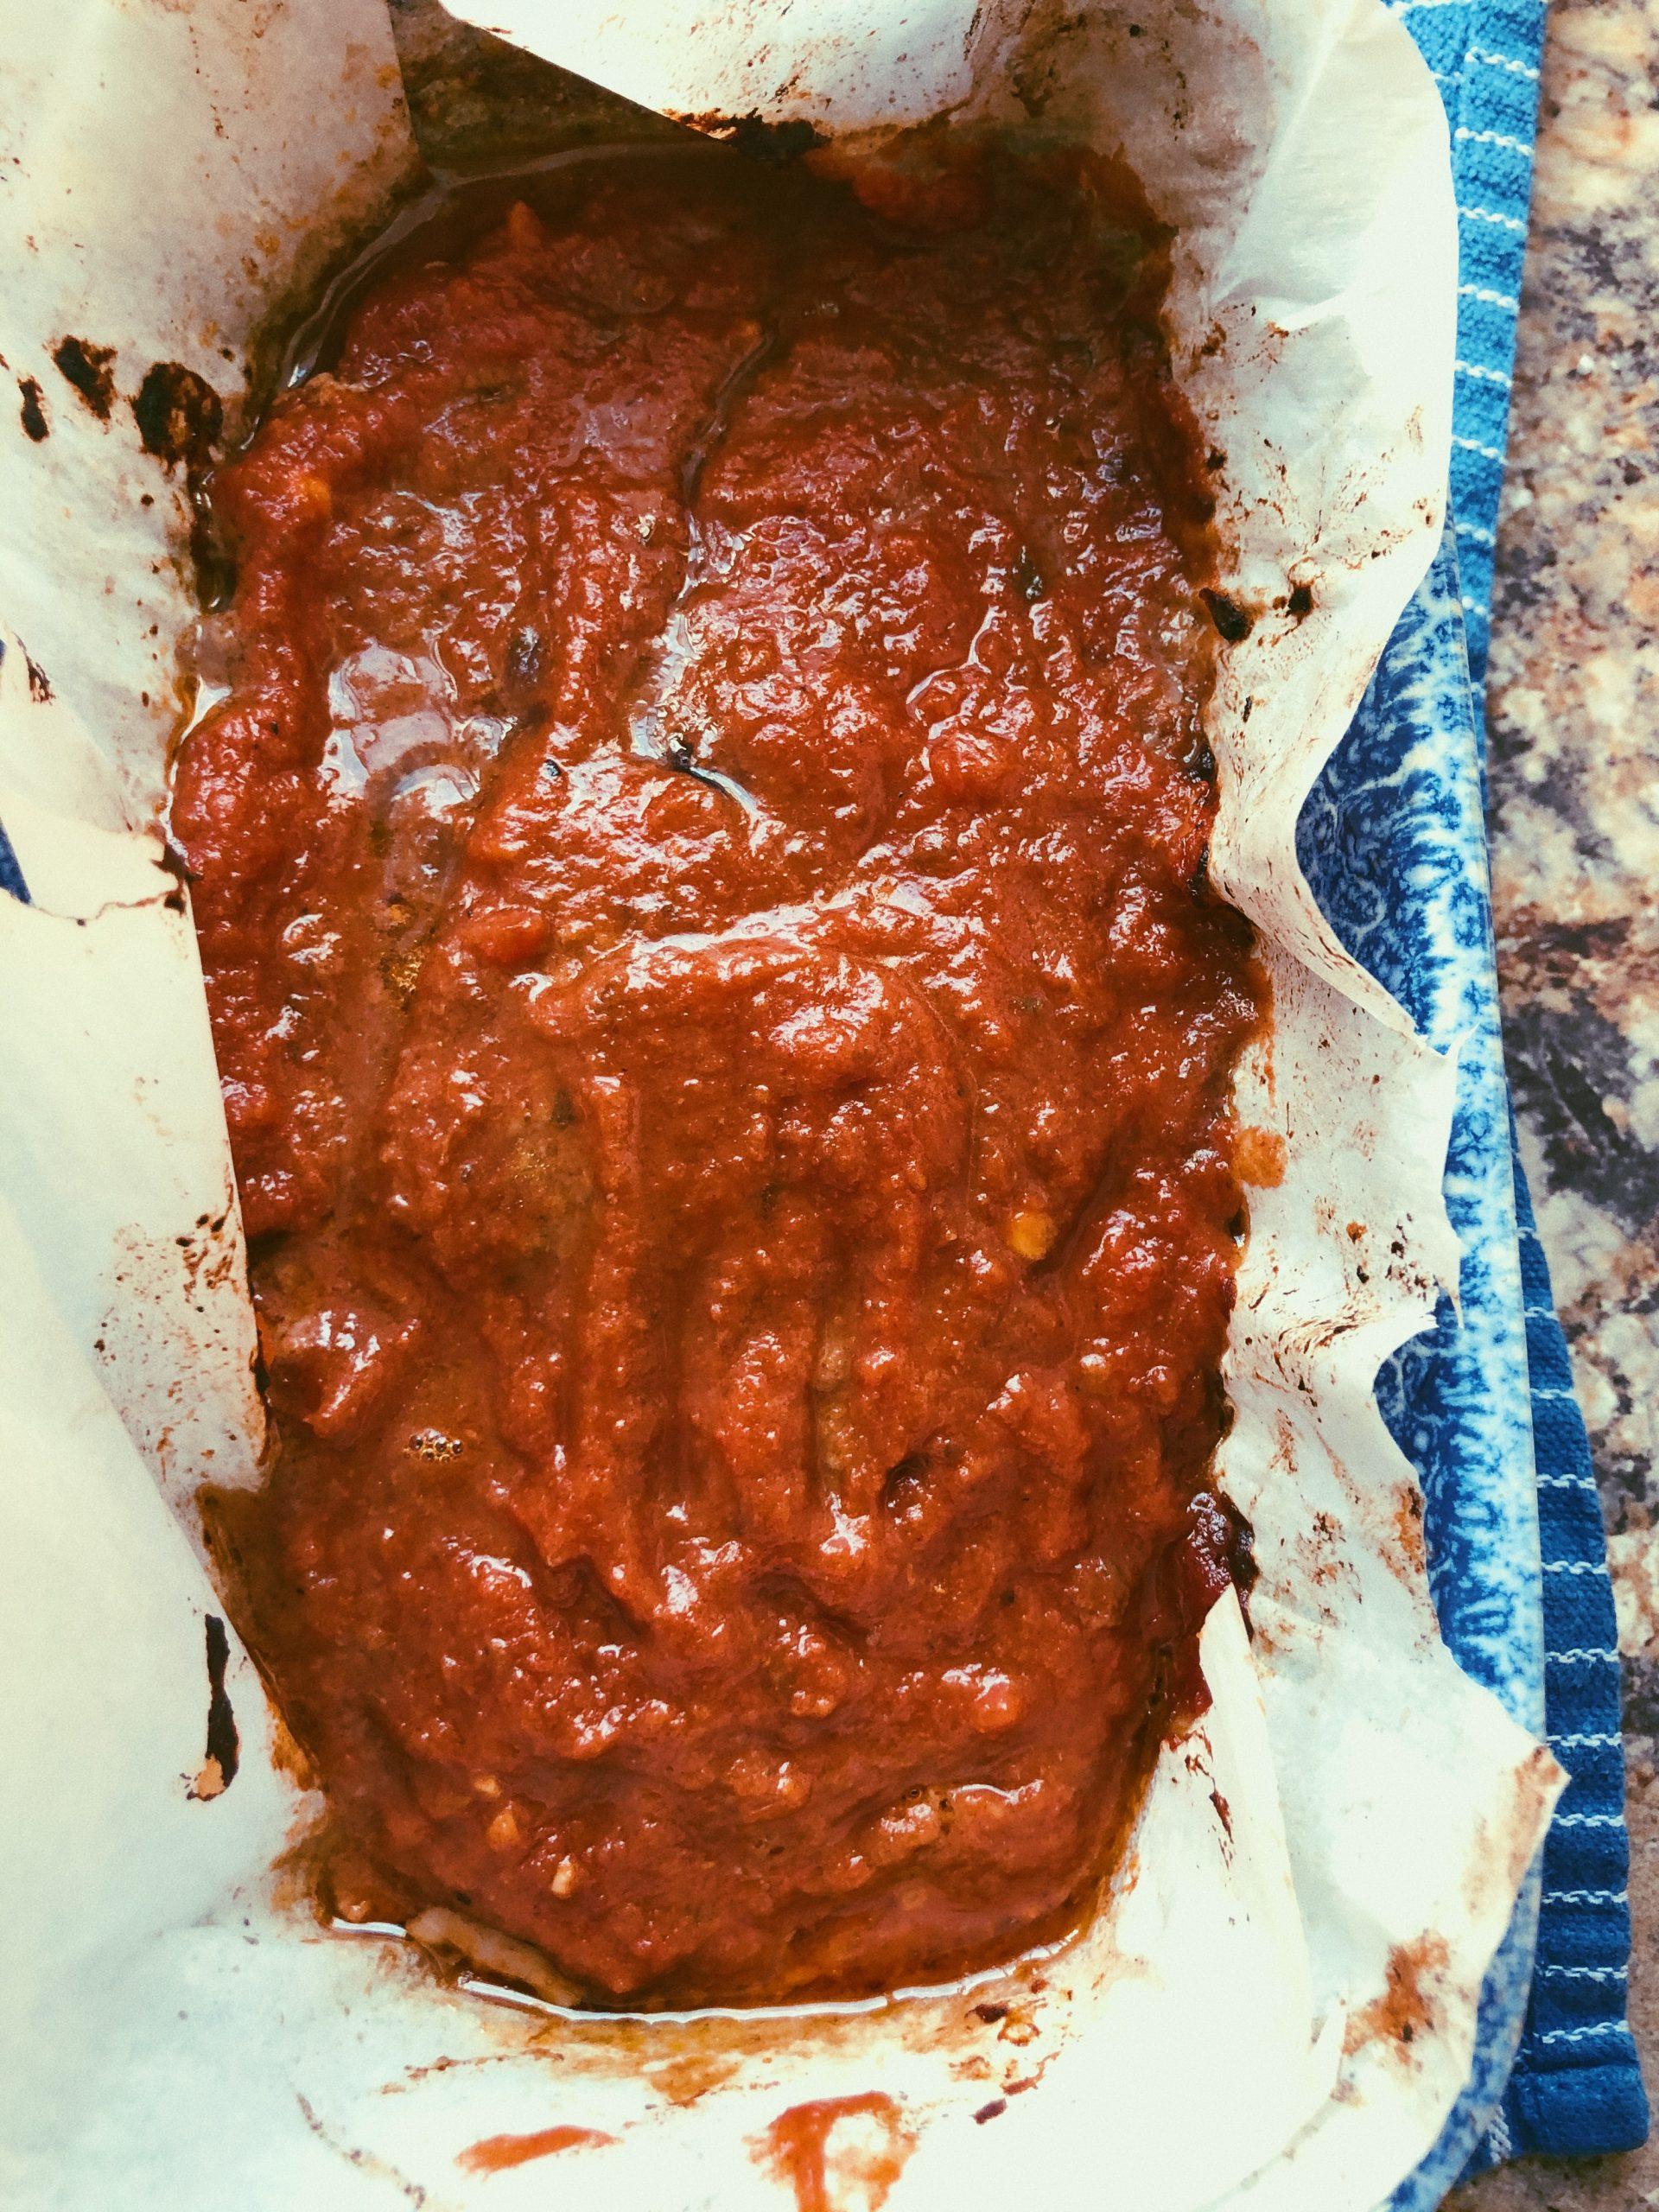 homemade meat loaf, paleo & scd diet